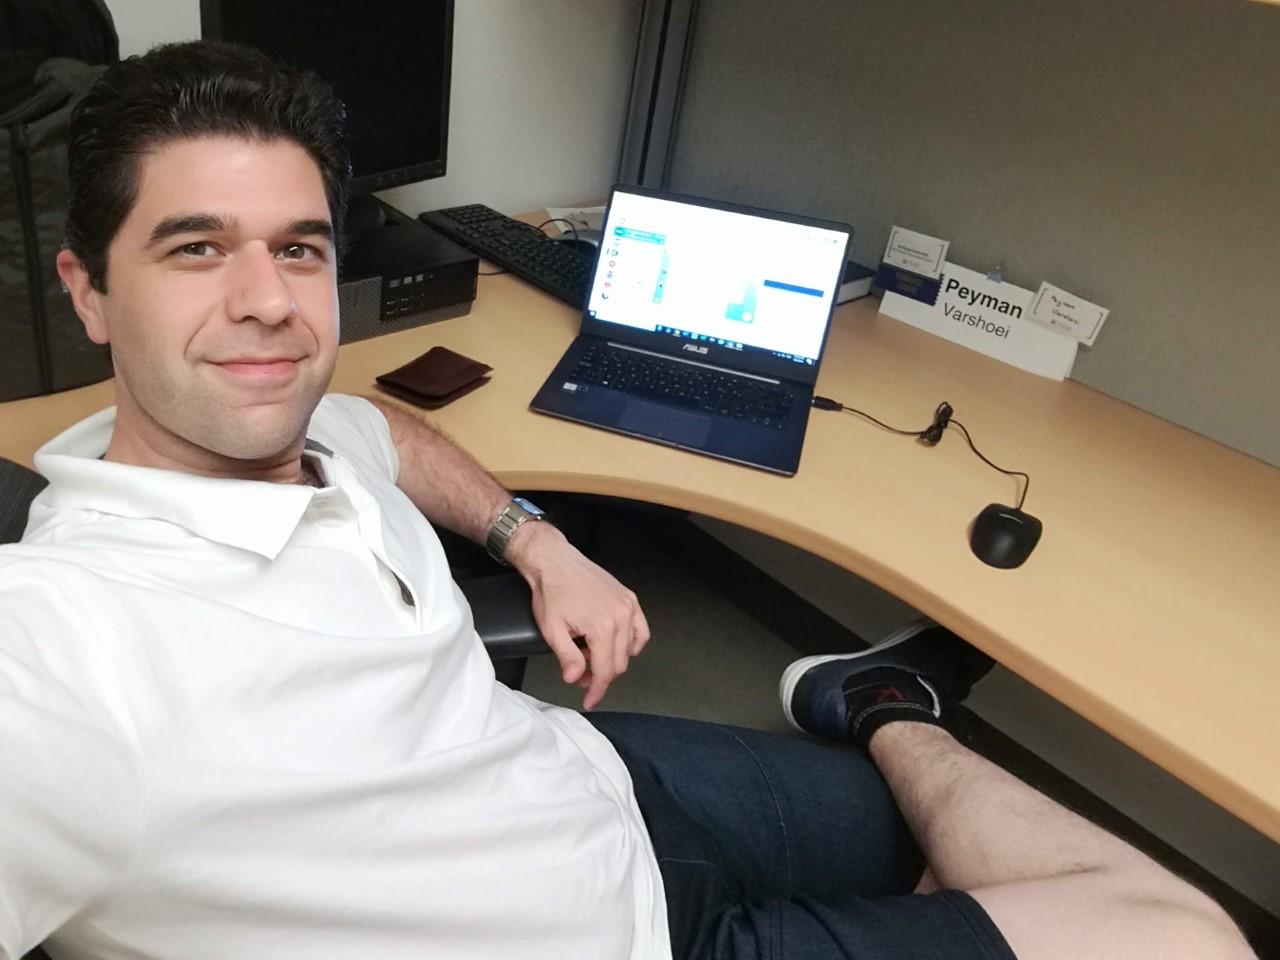 phd-student-peyman-varshoei-working-on-computer-casually-dressed